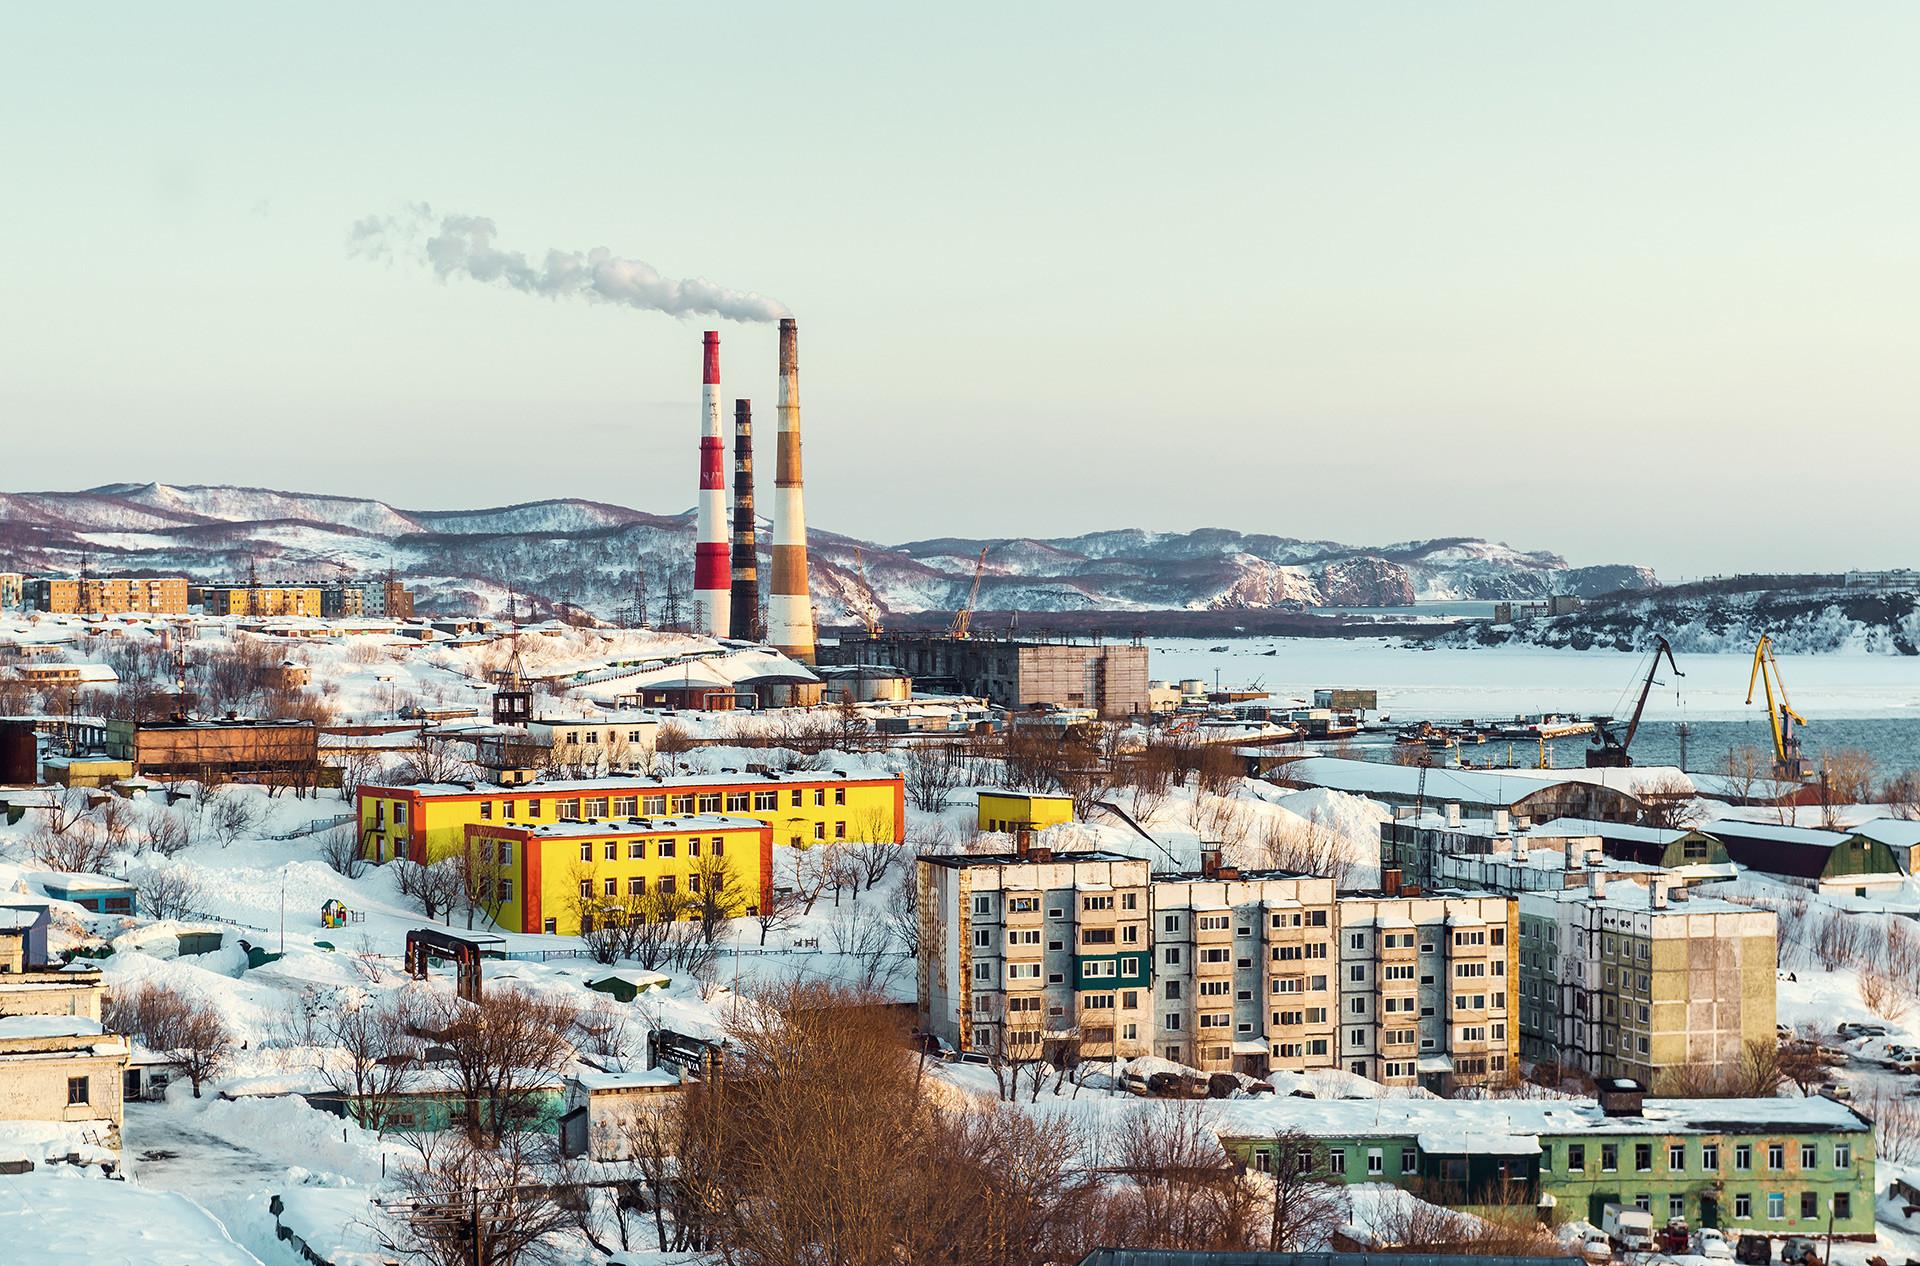 Petropavlovsk-Kamchatskiy, Russia